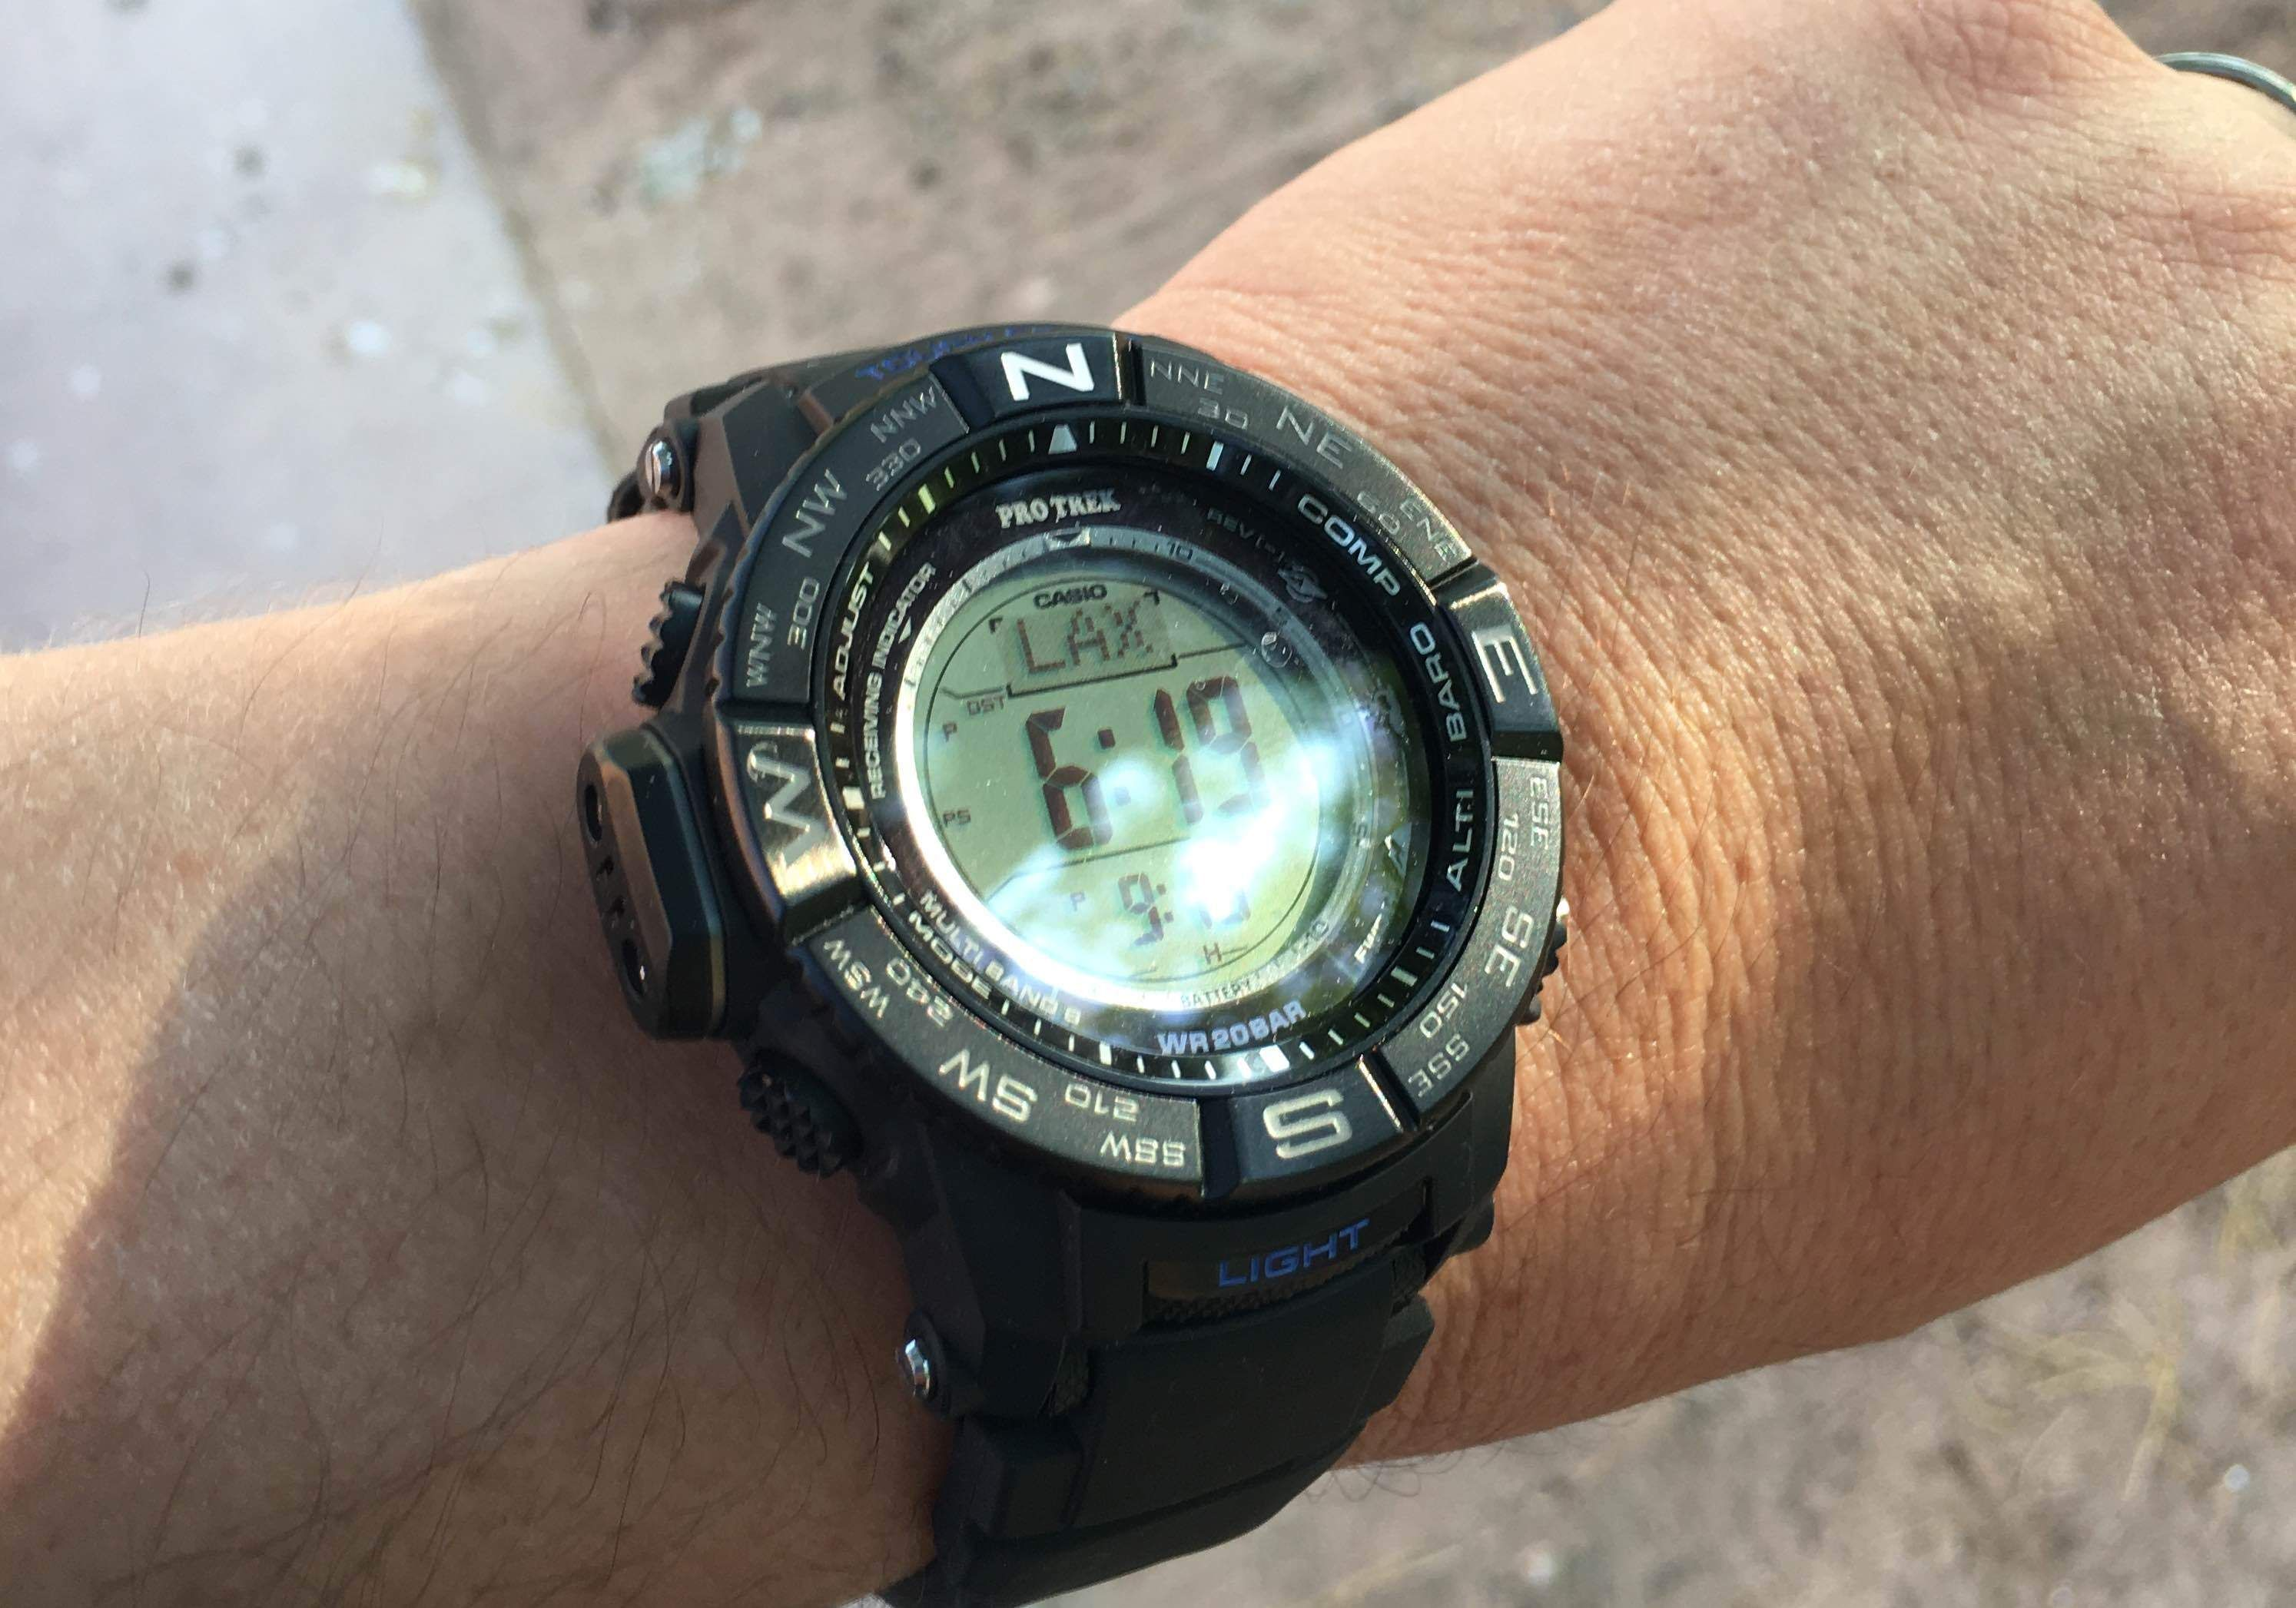 Pro Trek Prw 3510y 1er Protrek Digital Pinterest Jam Tangan Casio G Shock Dobel Time Tahan Air Black List Orange